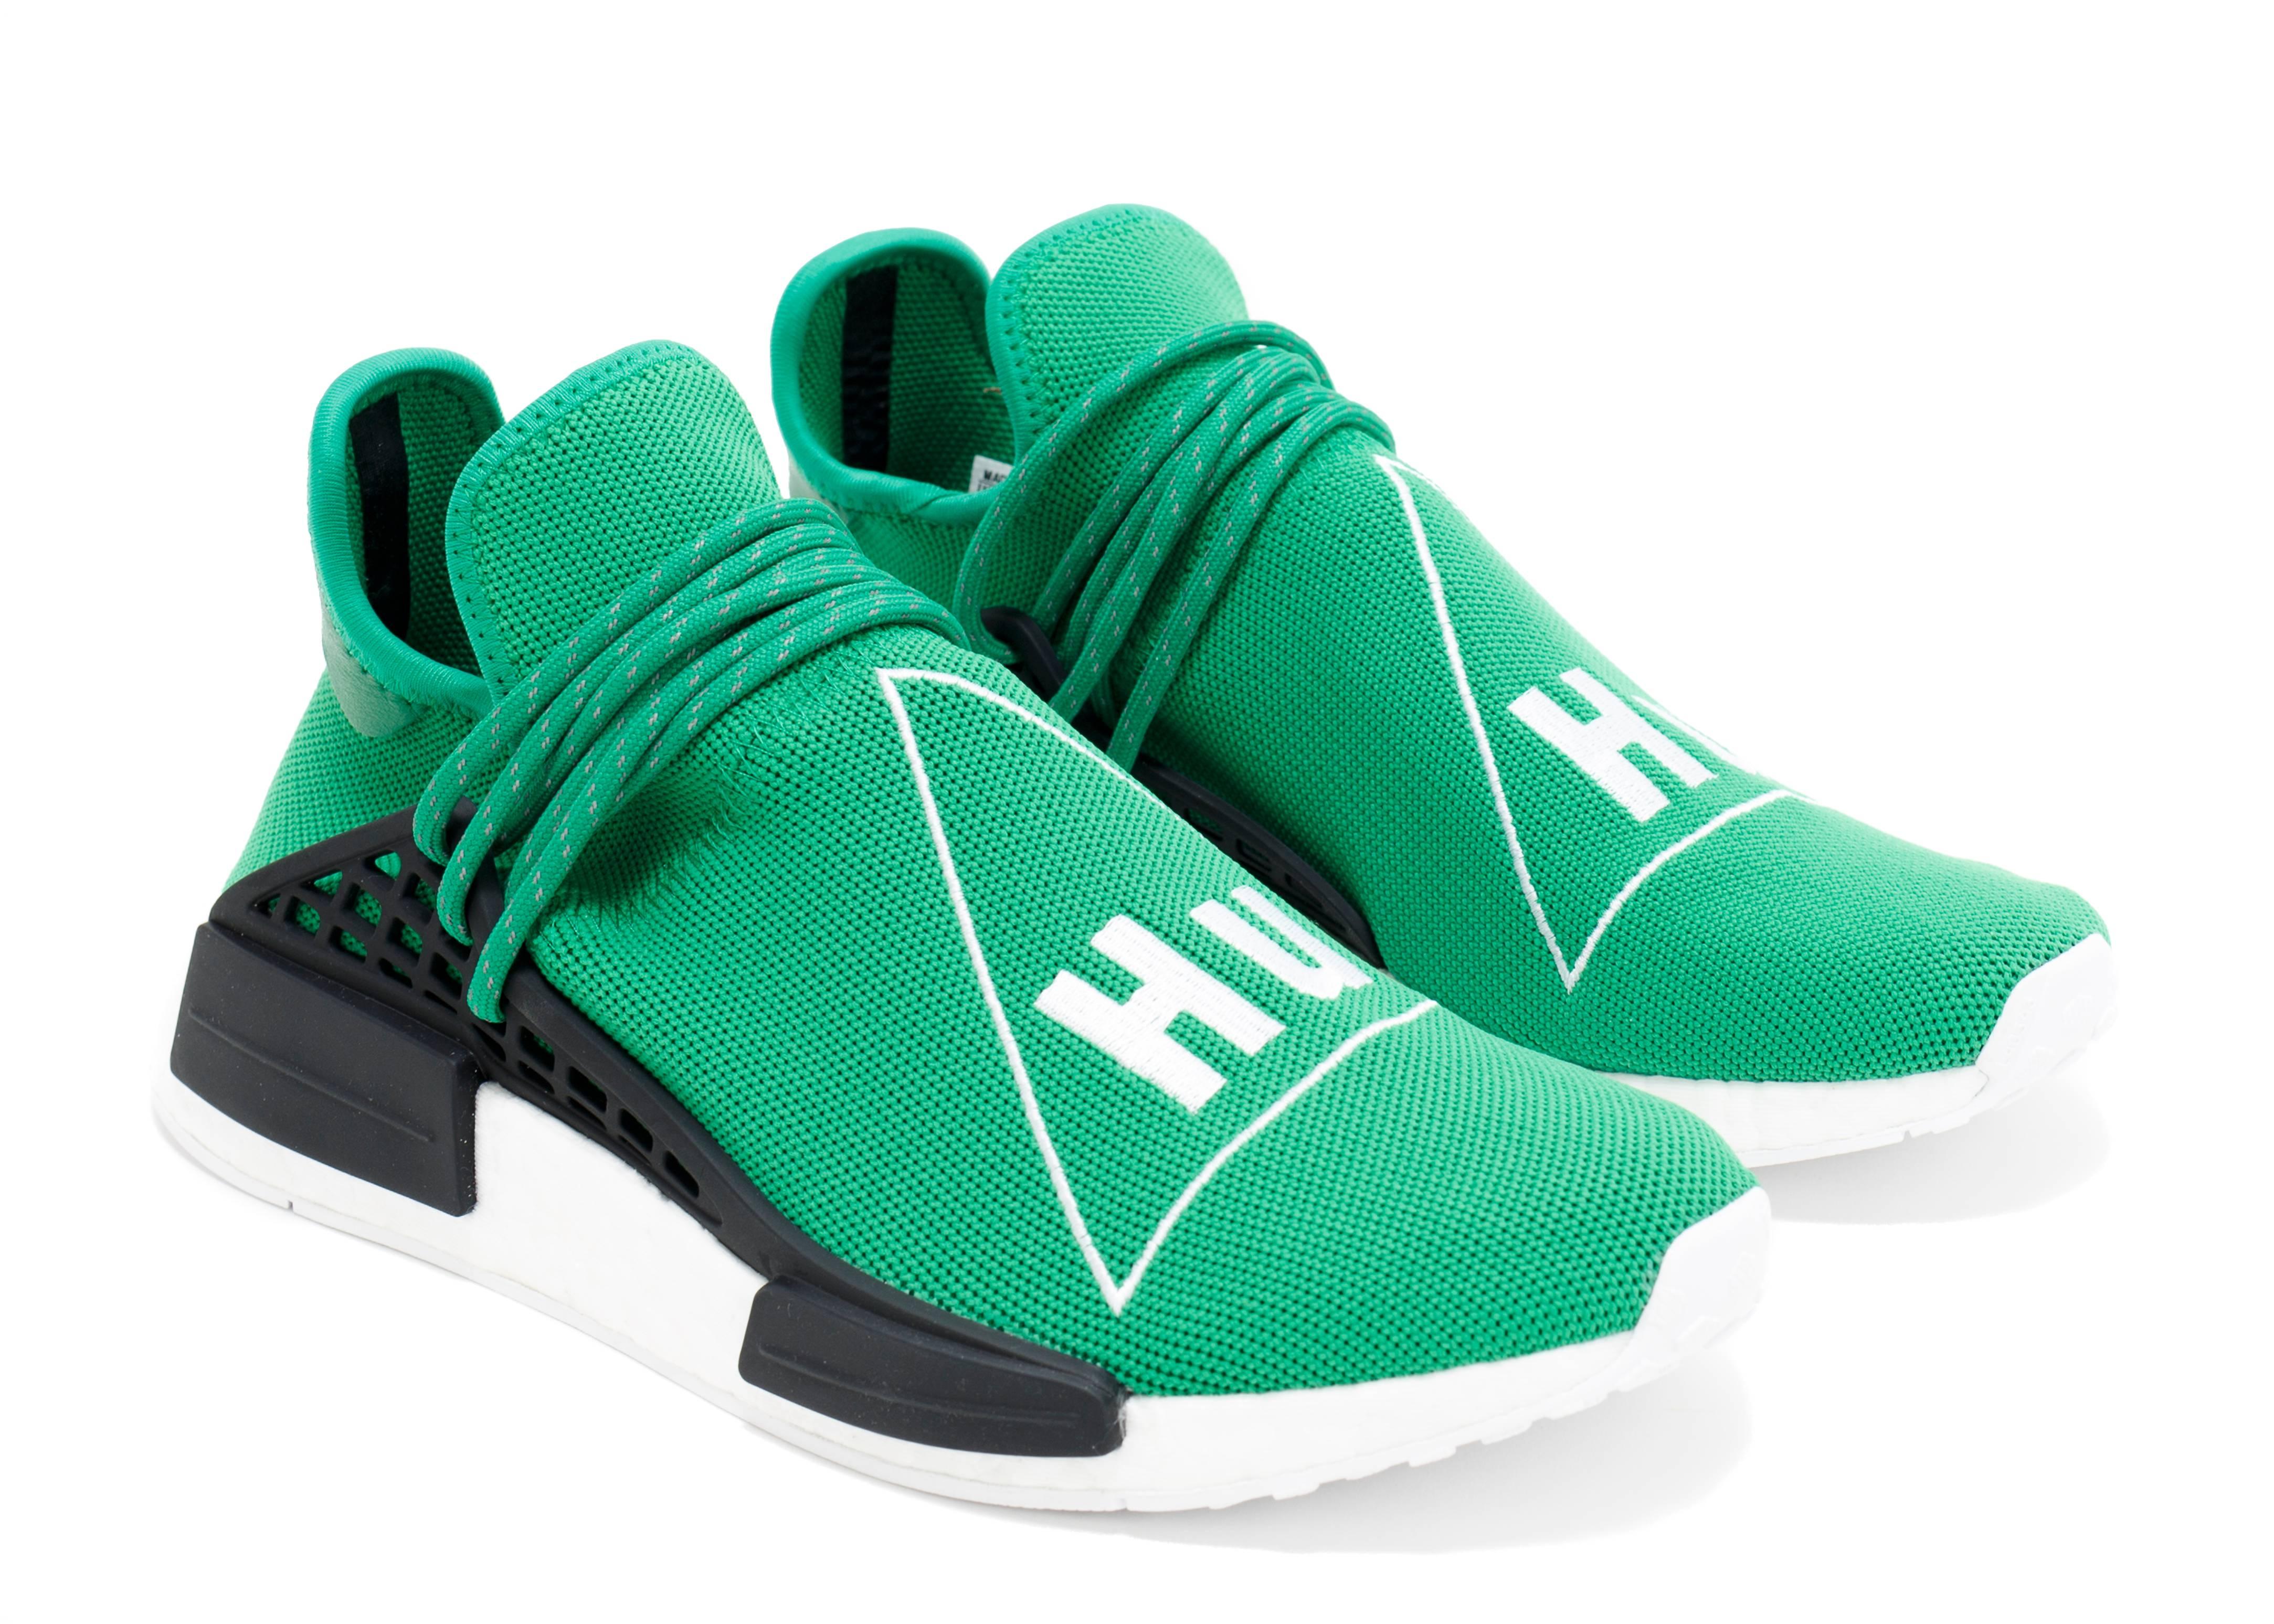 Adidas Human Race Nmd Green